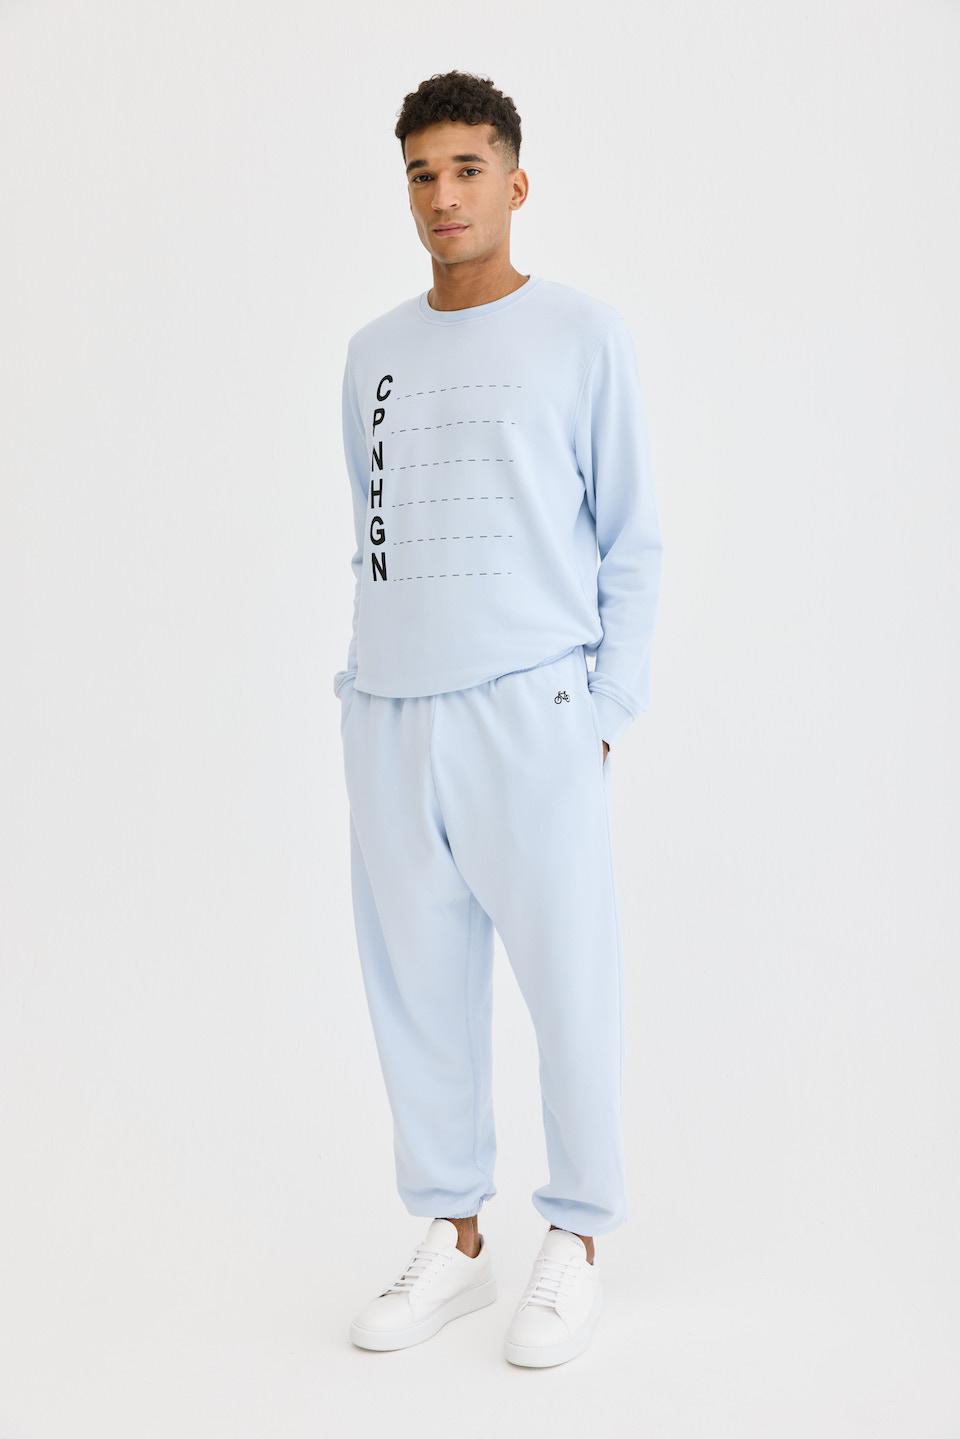 CPH Sweatpants 1M org. cotton light blue